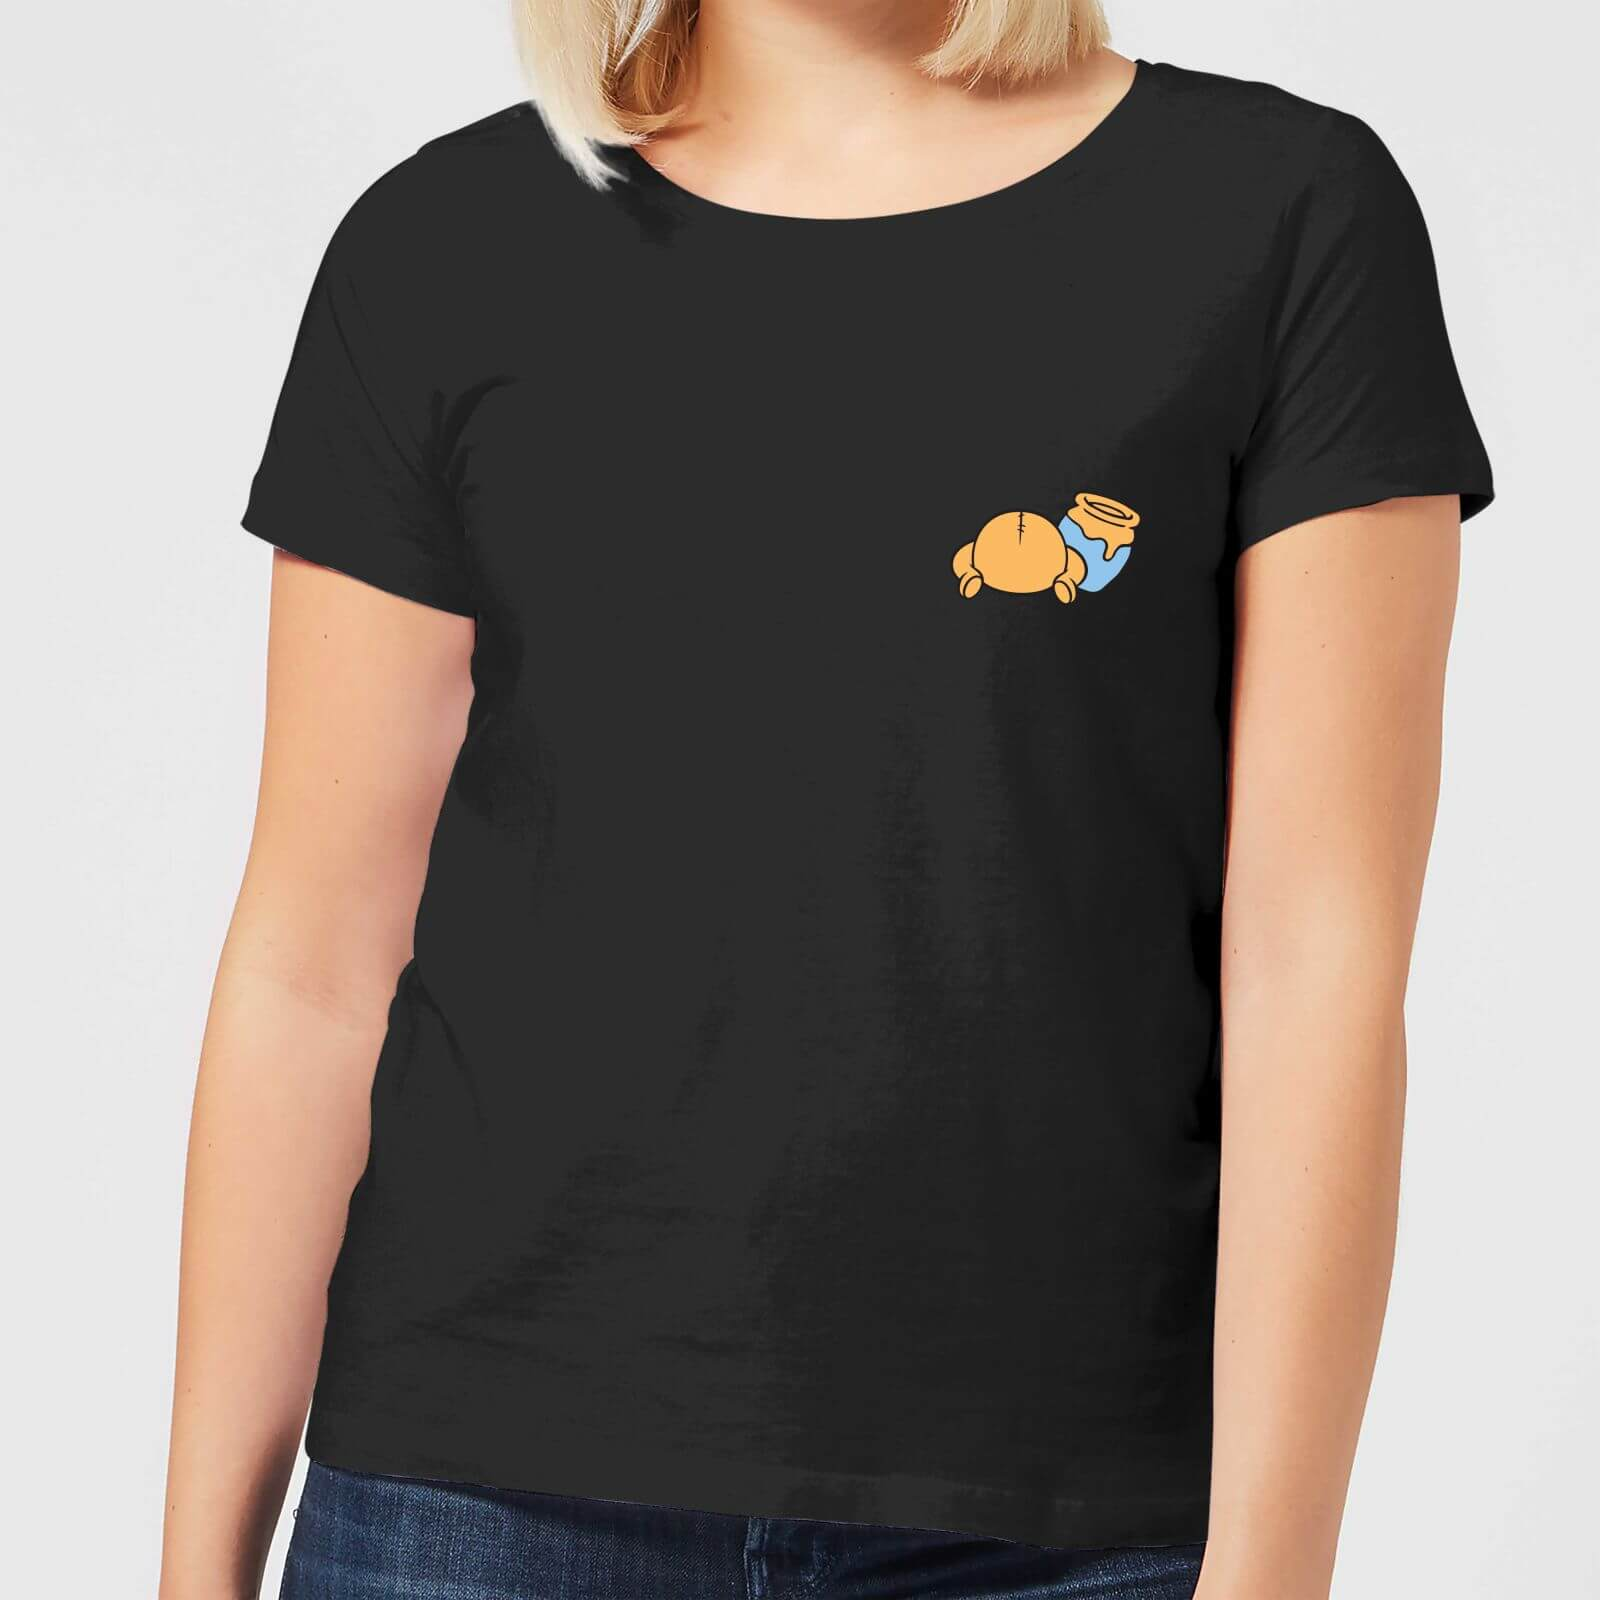 Disney Disney Winnie The Pooh Backside Women's T-Shirt - Black - 4XL - Black